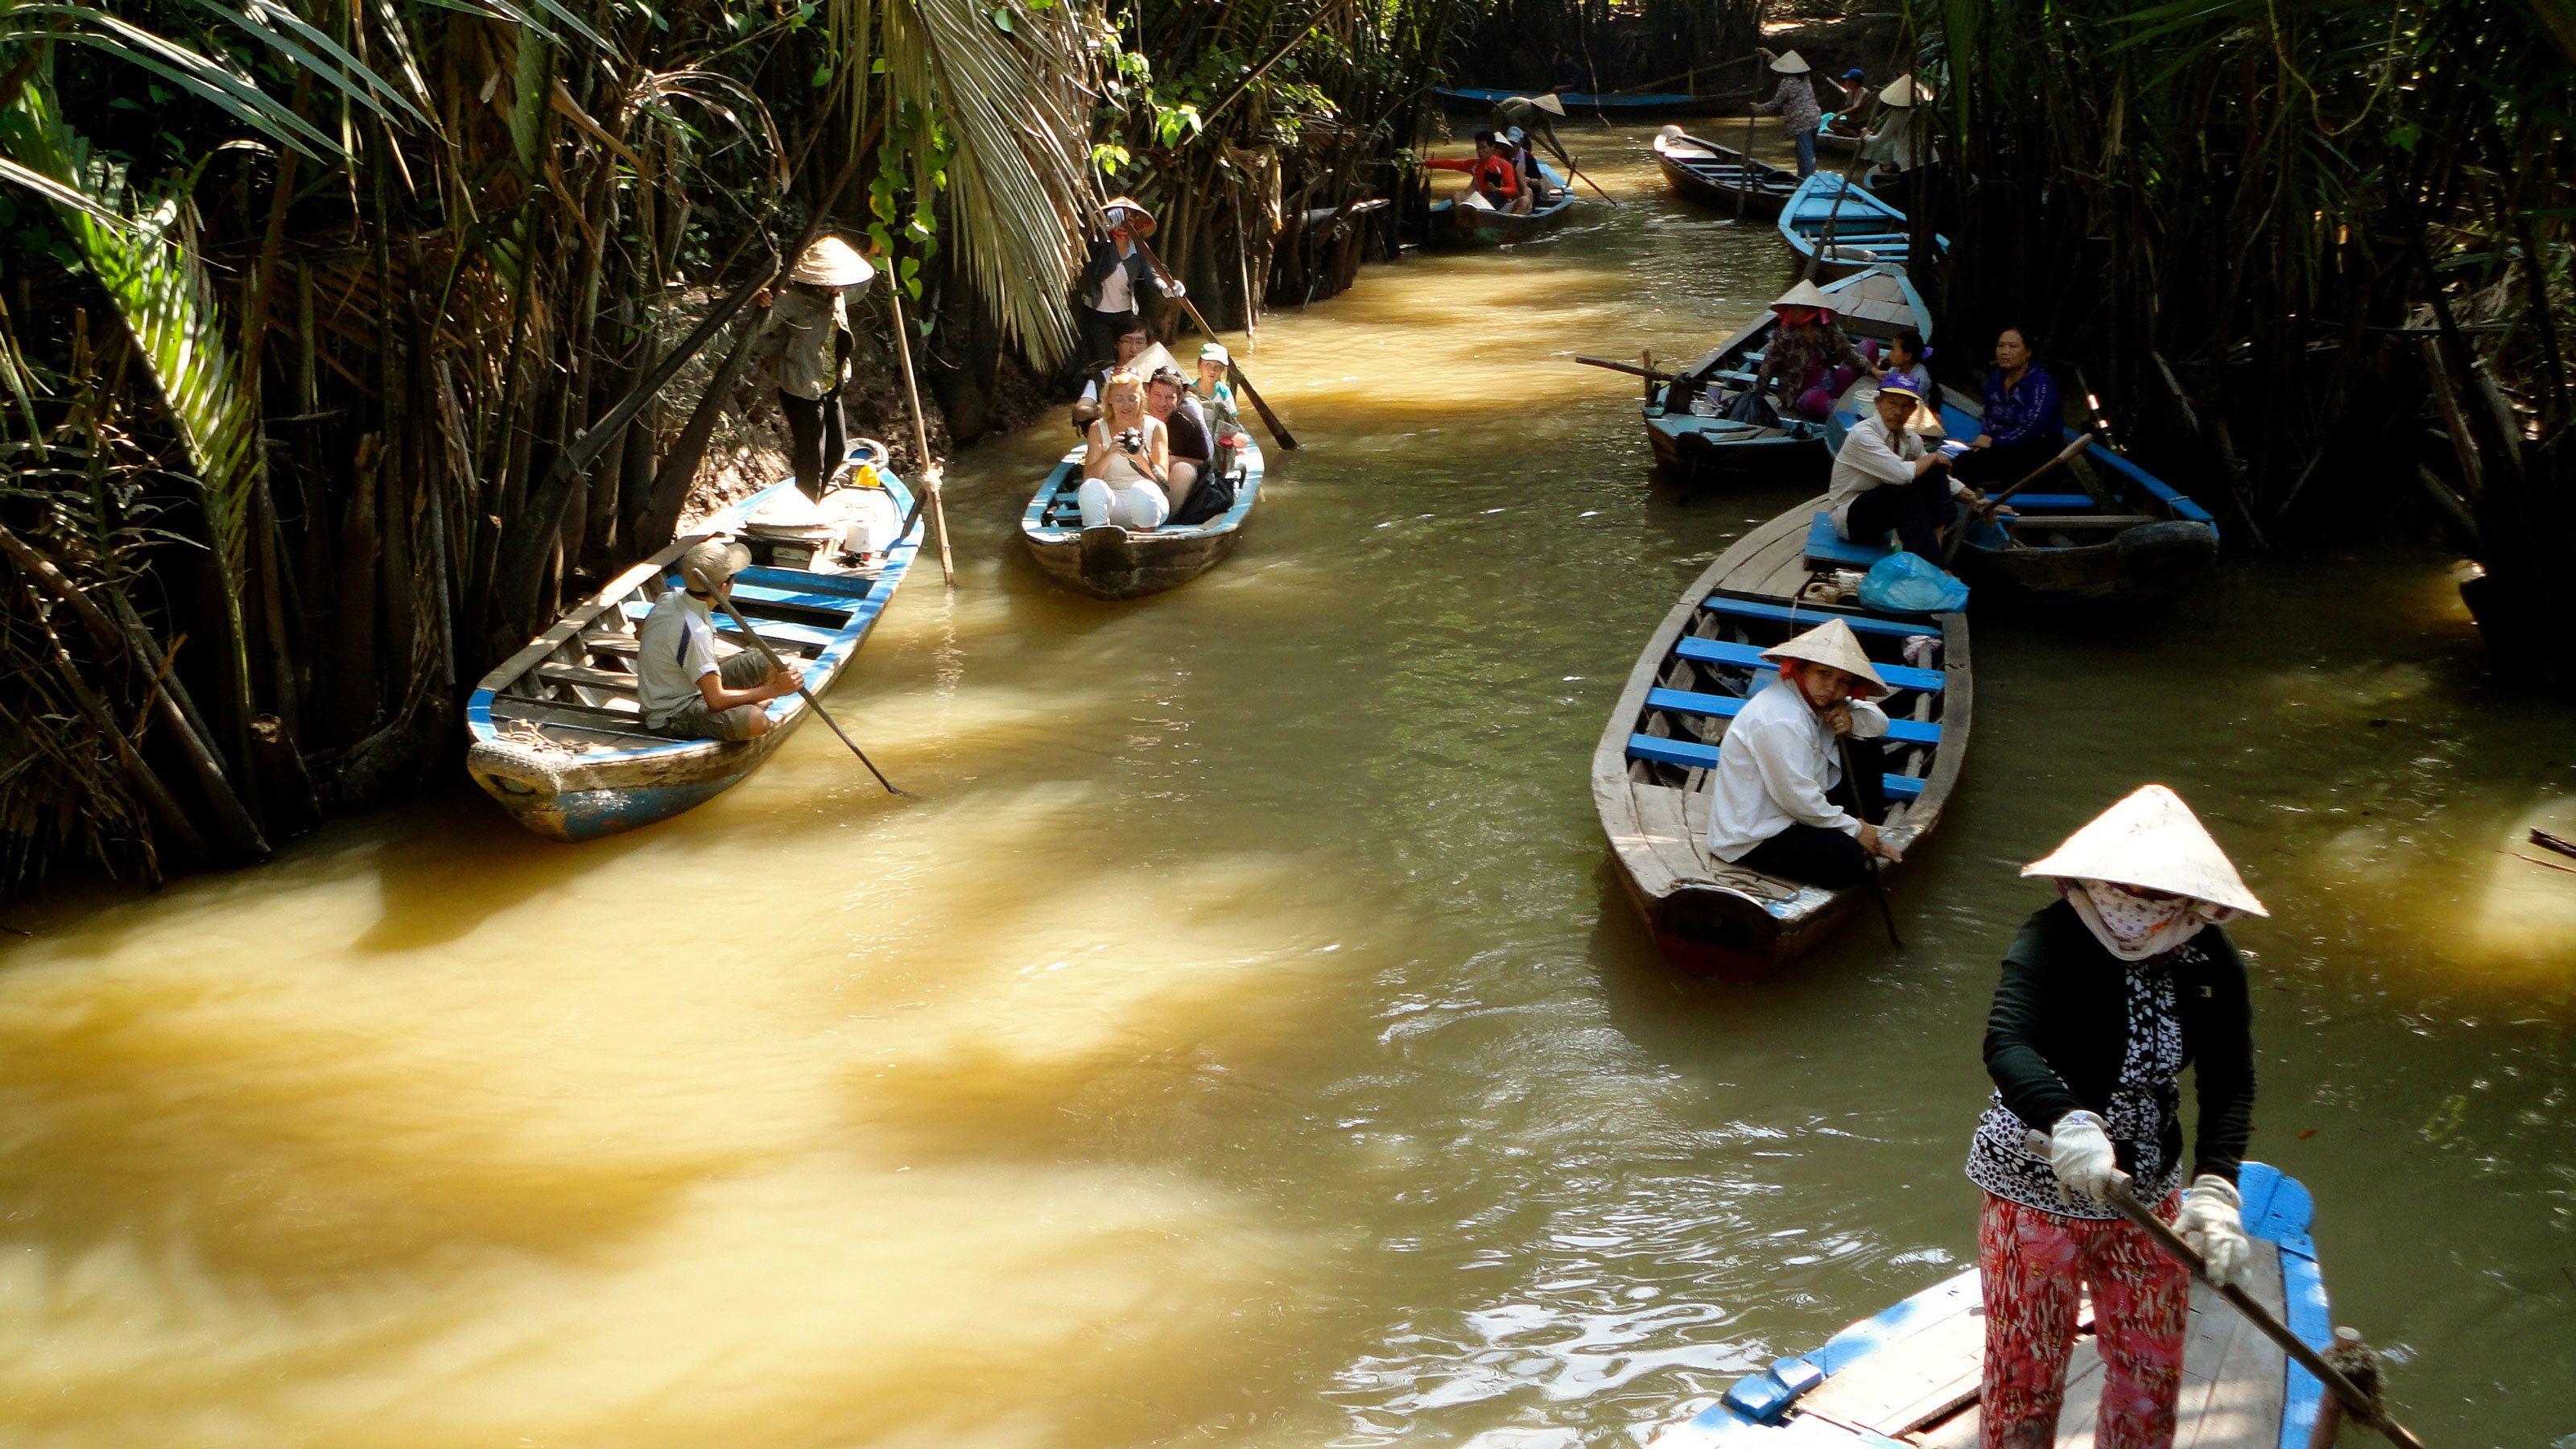 Scenic river cruise along the beautiful Mekong River in Vietnam